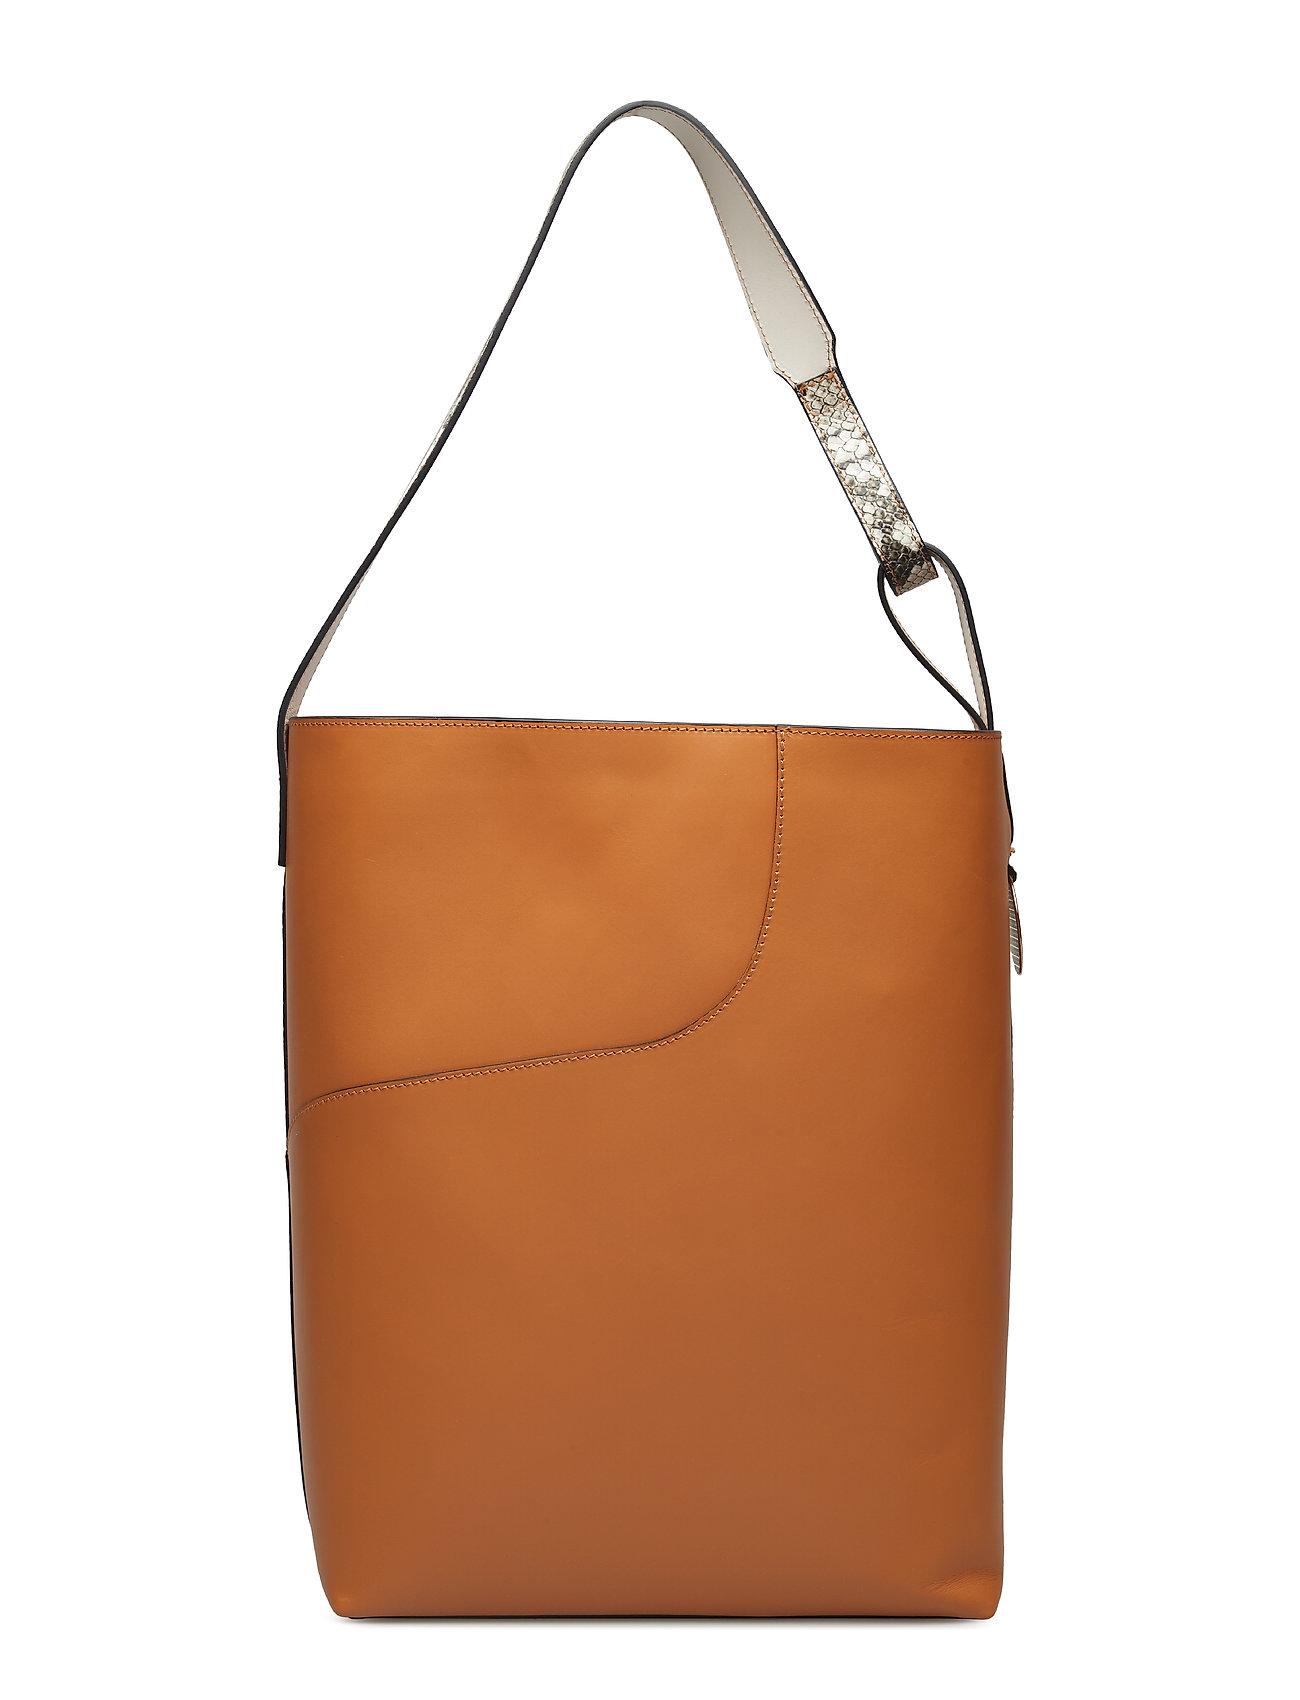 Pienza TerraGreyIce White VacchettaPrinted Bags Shoppers Fashion Shoppers Orange ATP ATELIER